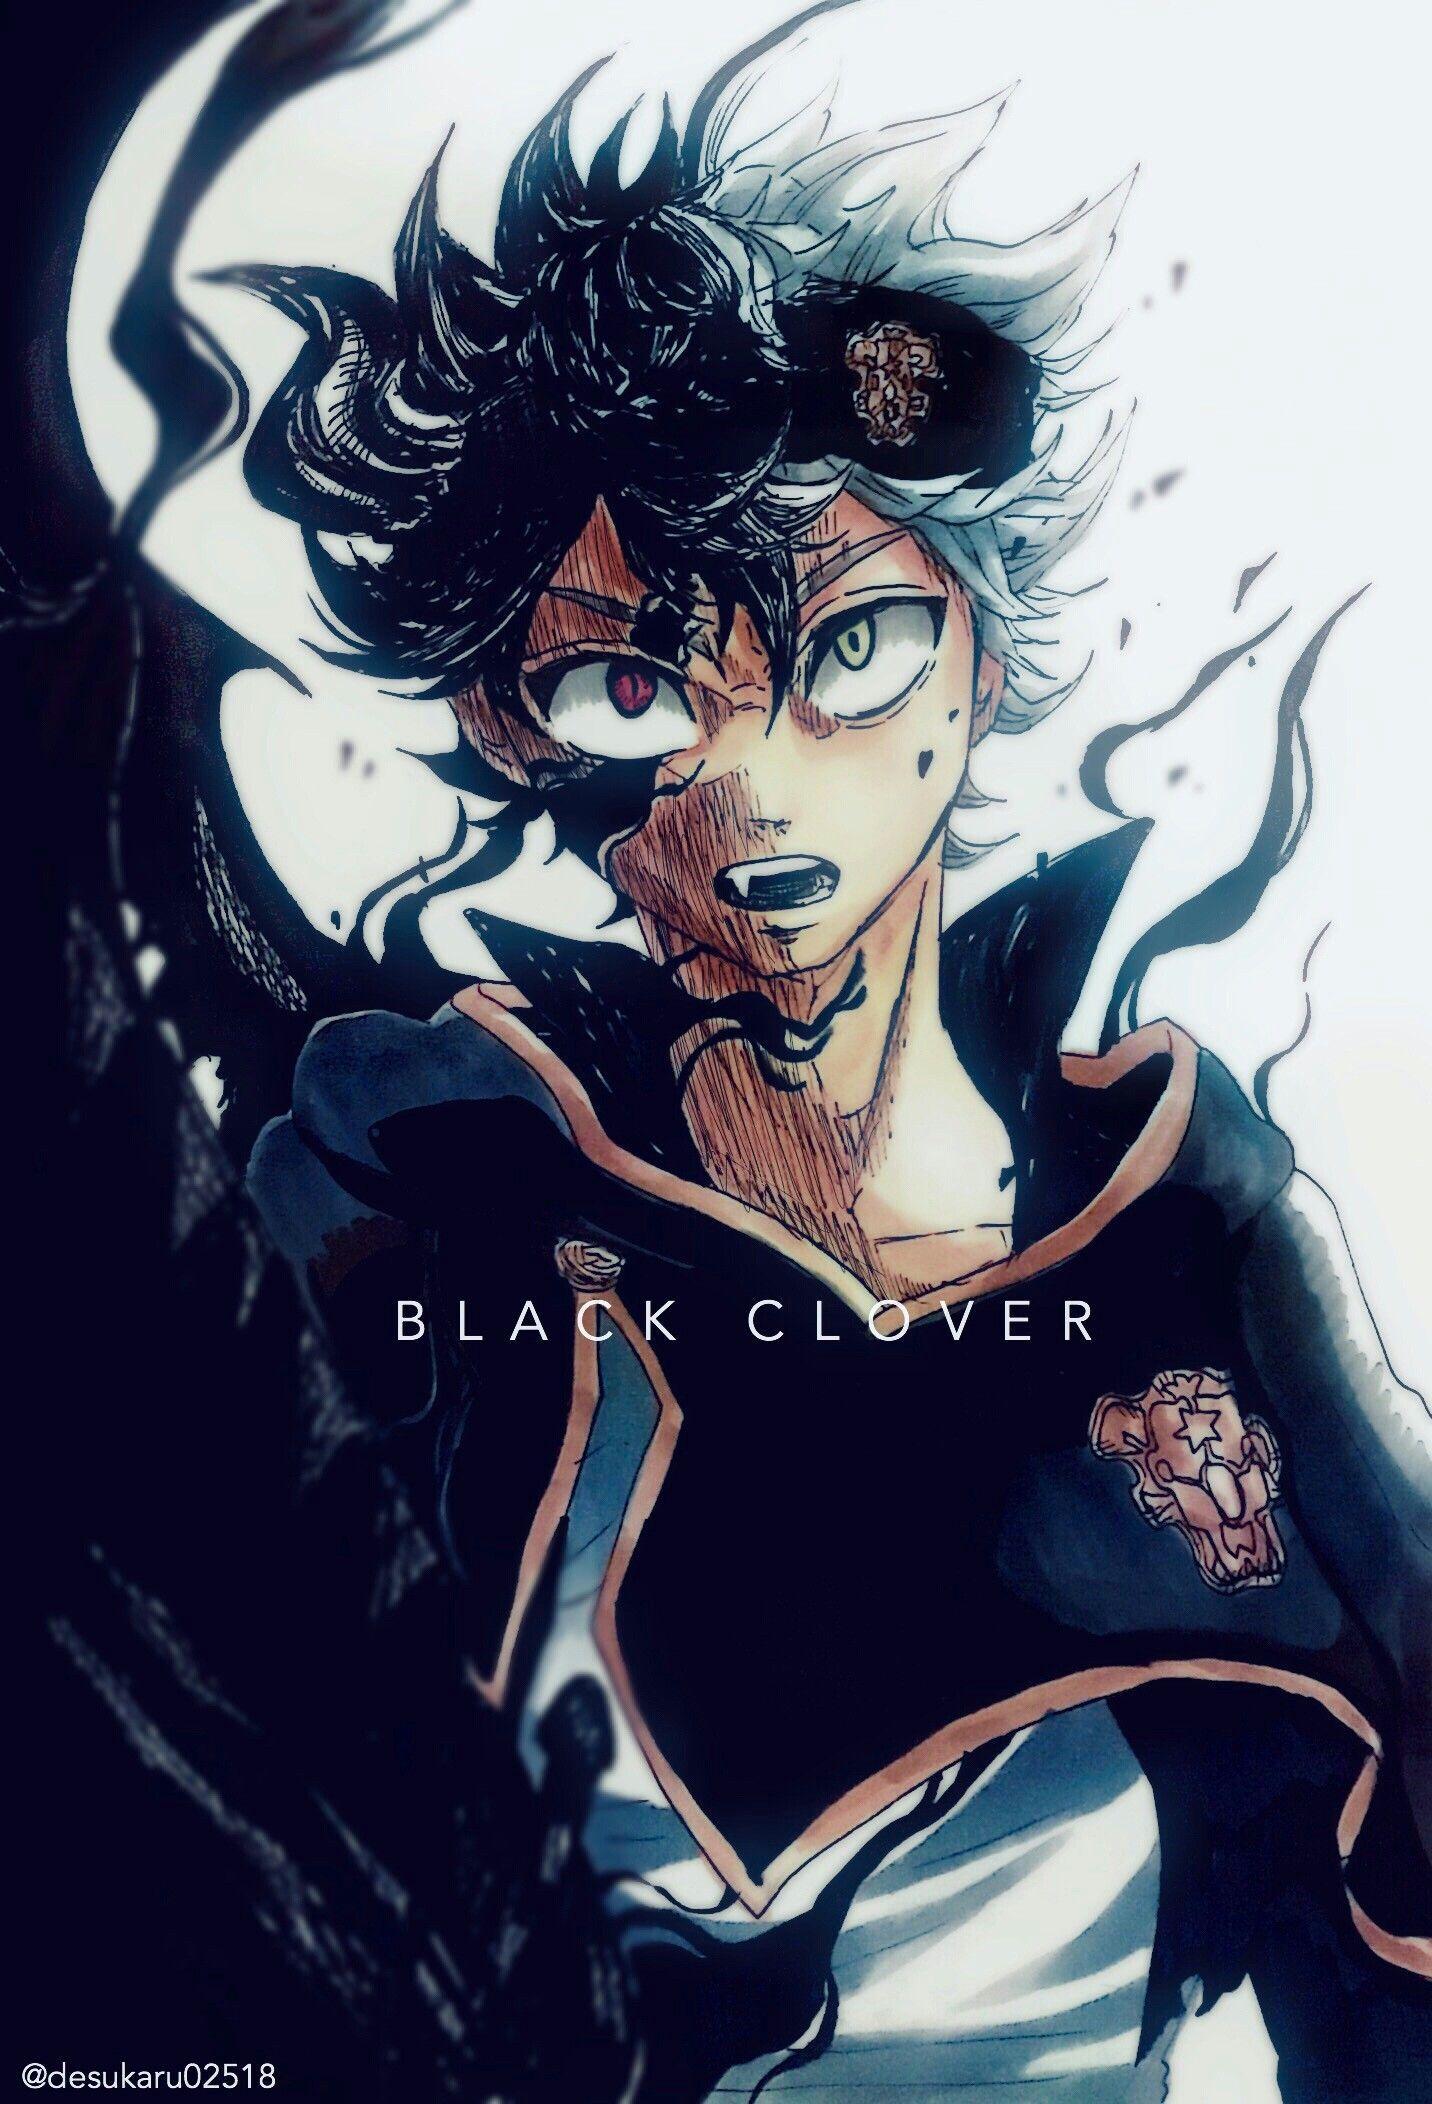 Nero Black Clover Human Form Wallpaper | SfondiCro